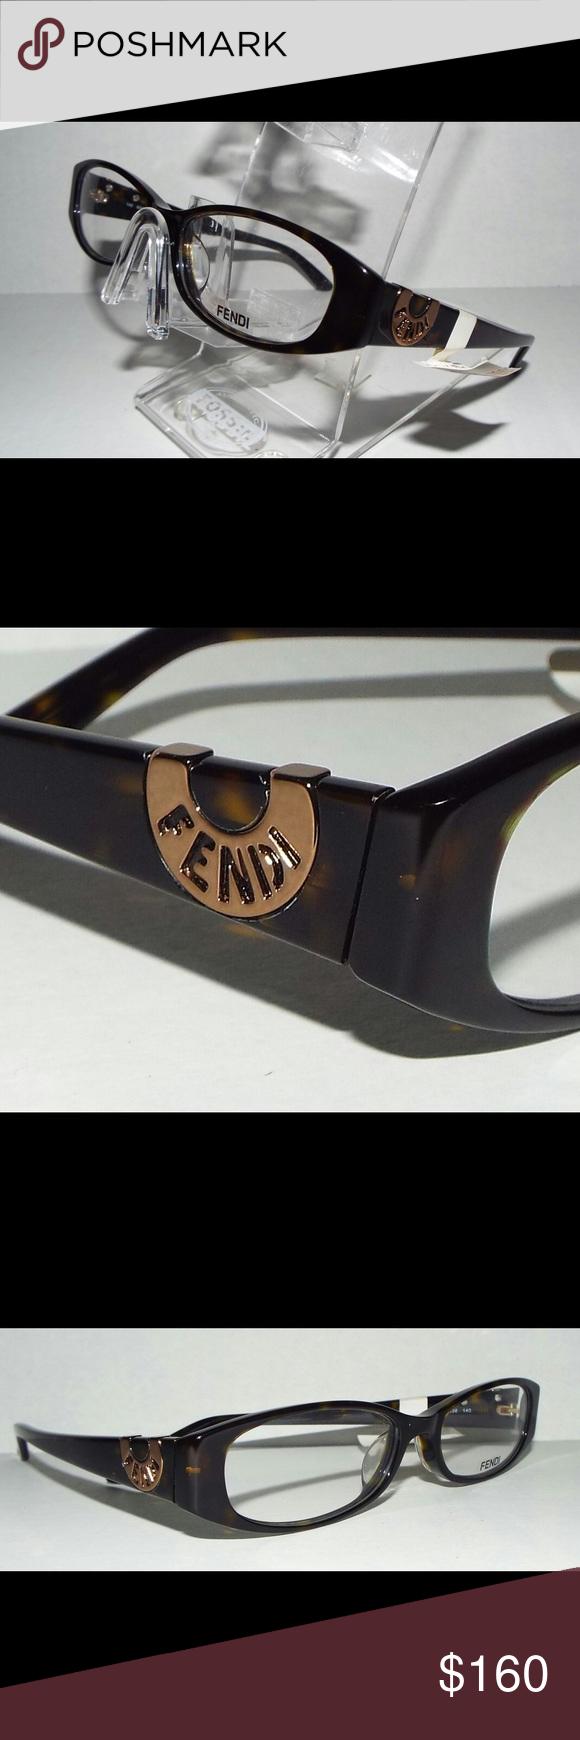 3072ff7f4f0a Fendi Designer Frame Fendi Frame Fendi Accessories Glasses